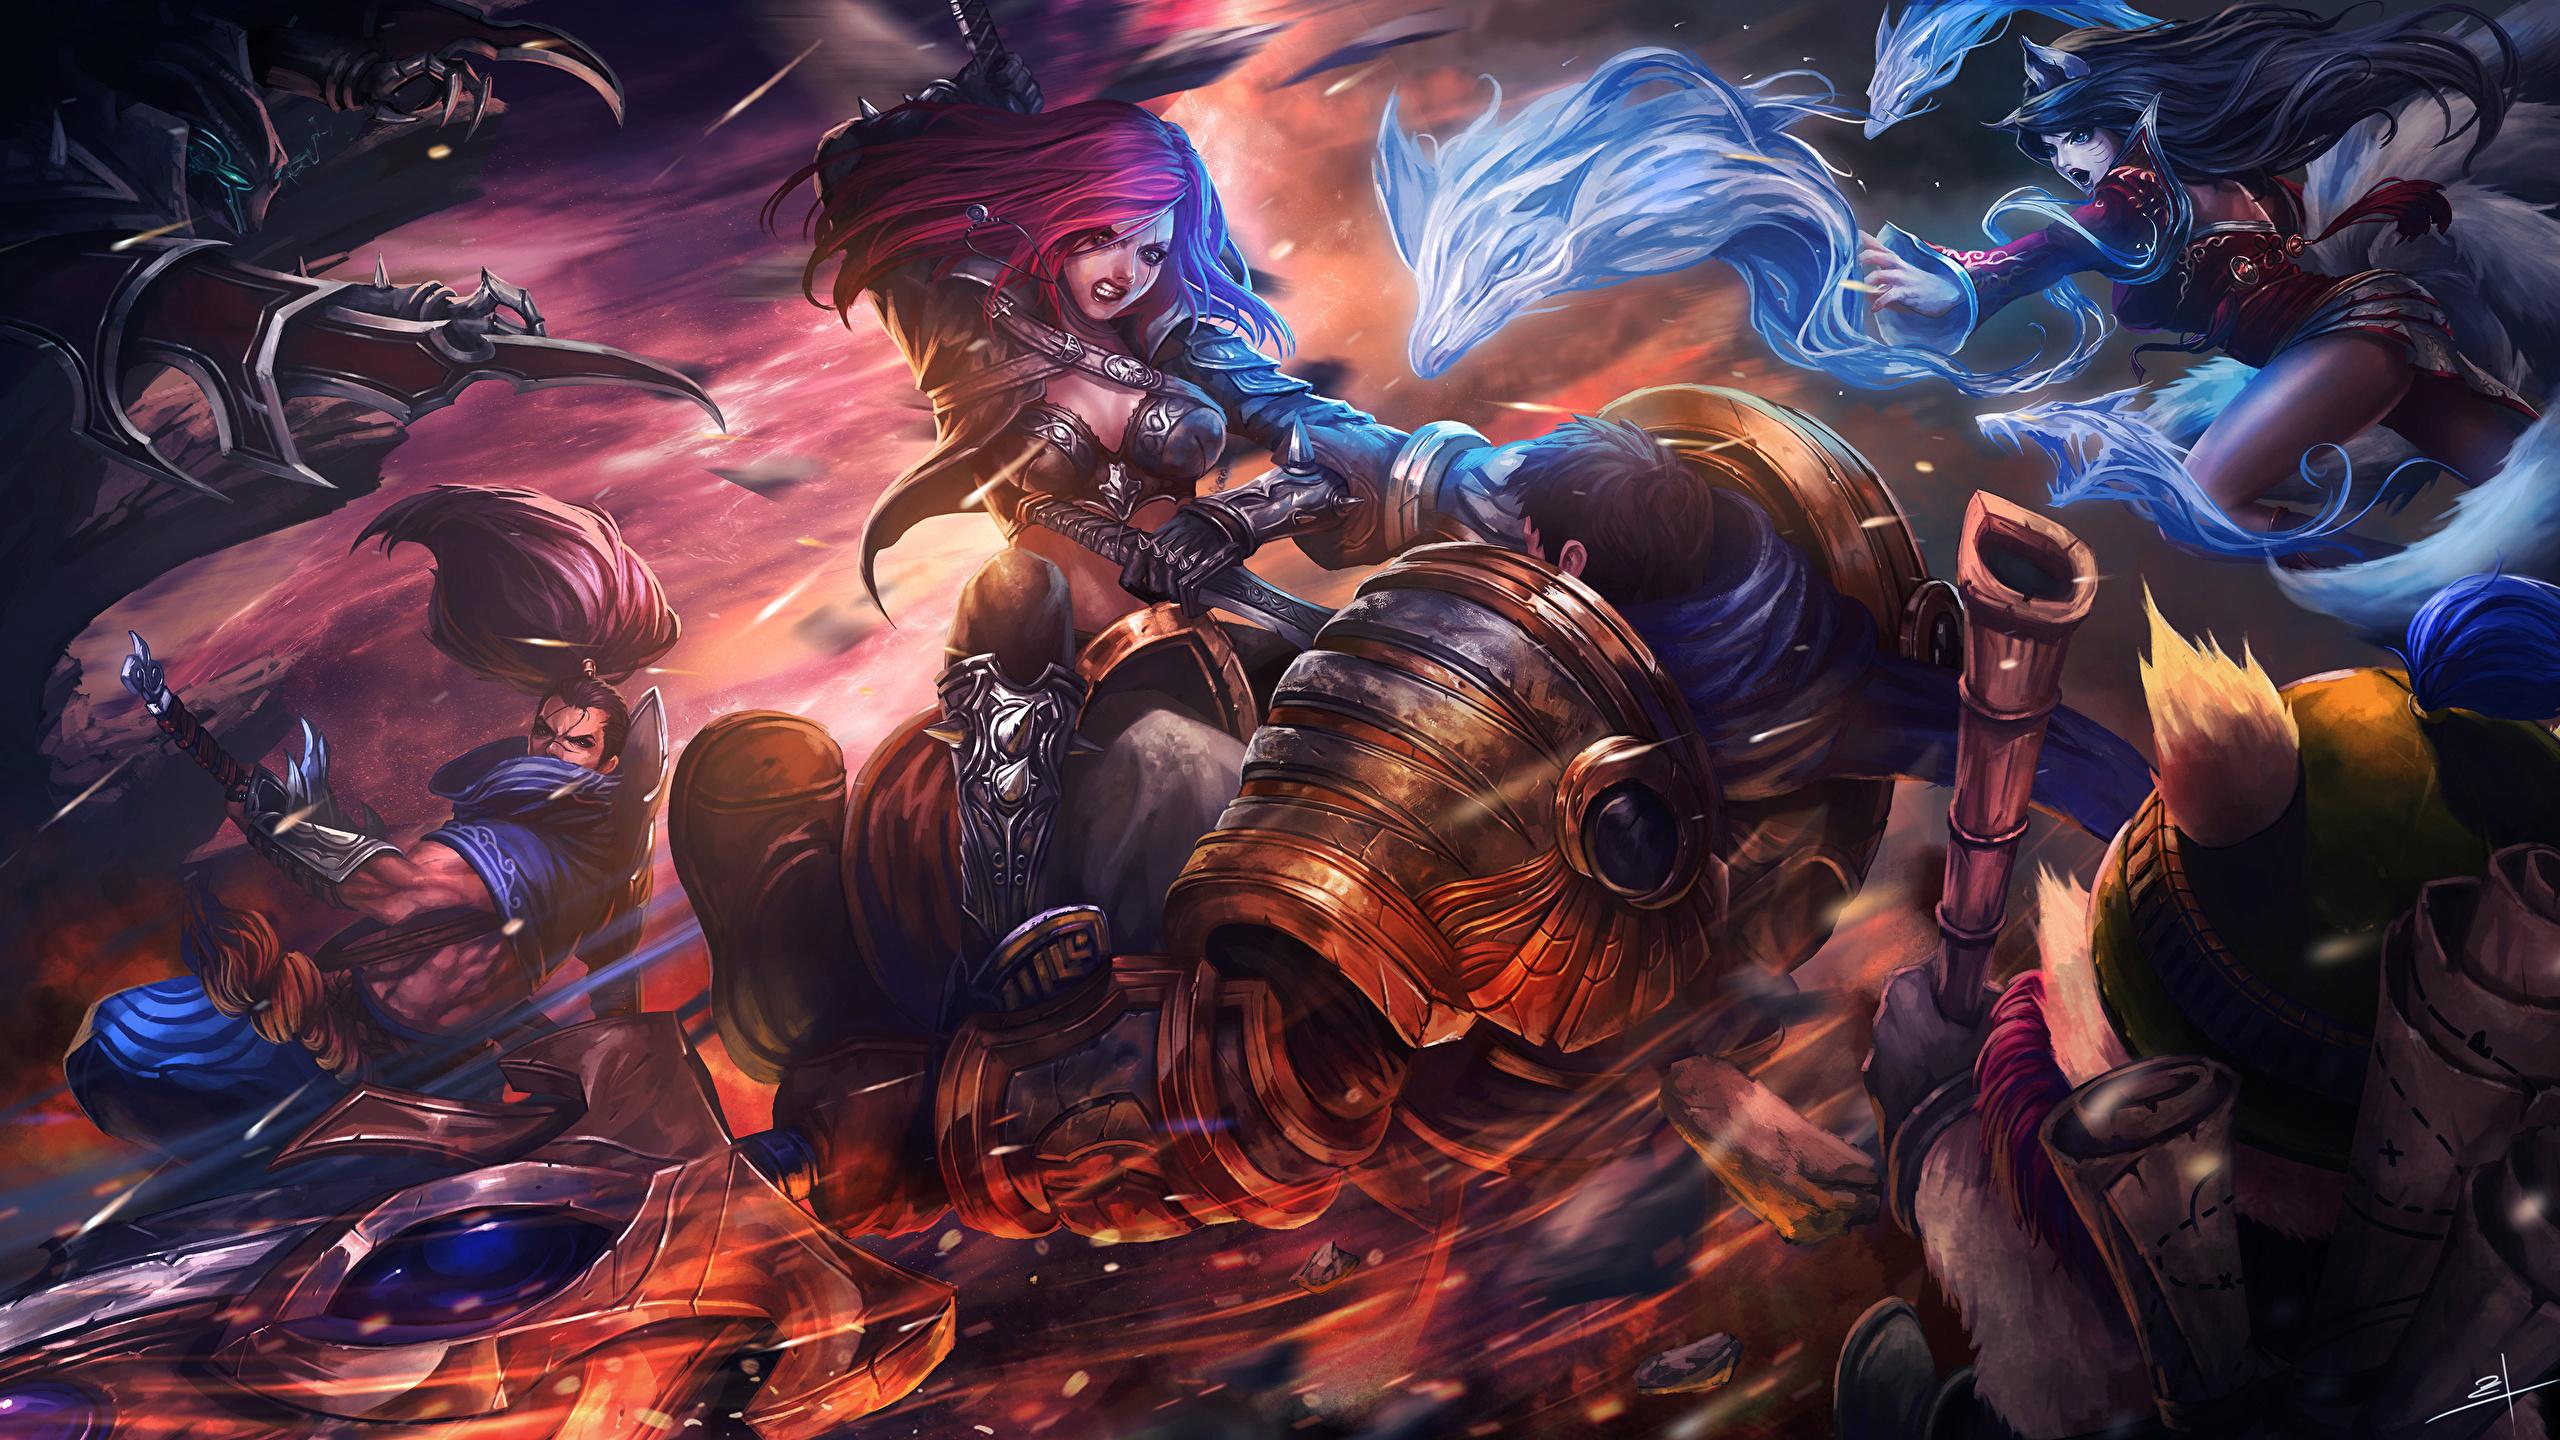 Photo Lol Warrior Katarina Girls Fantasy Vdeo Game 2560x1440